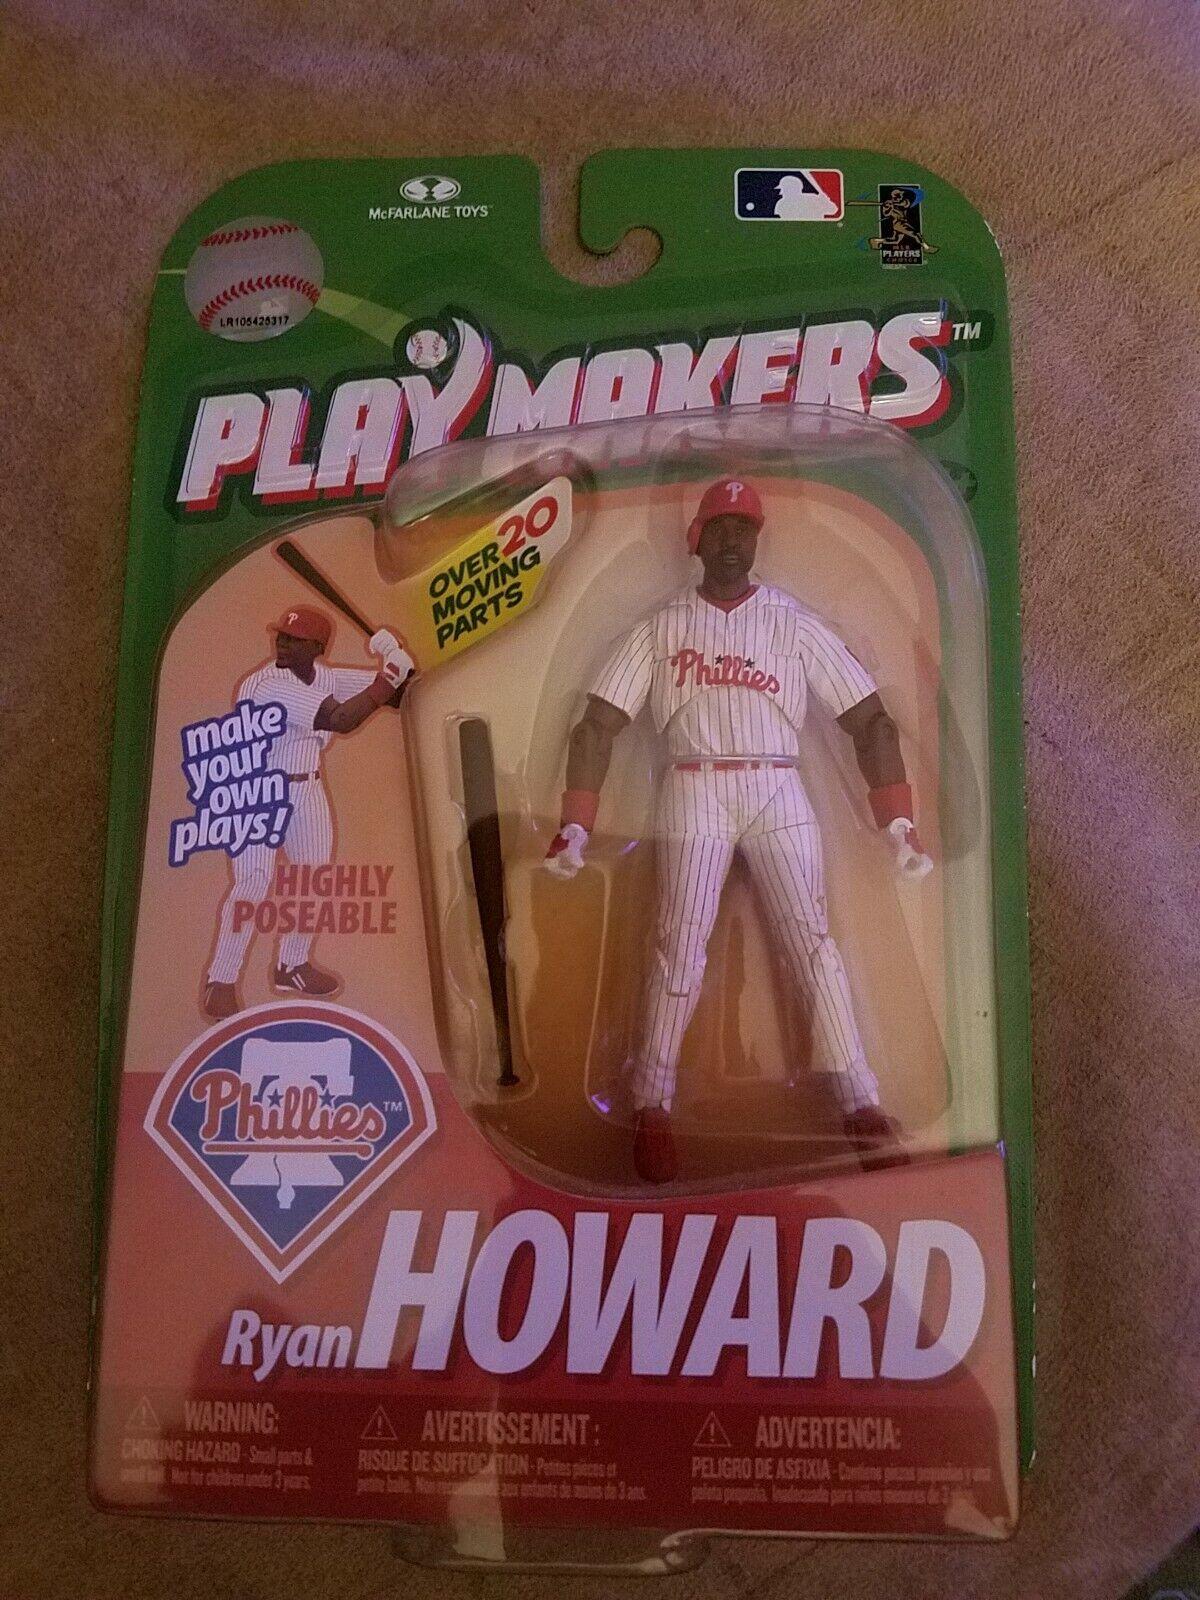 MLB Baseball Ryan Howard Phillies Playmakers McFarlane Toys Figure NIB